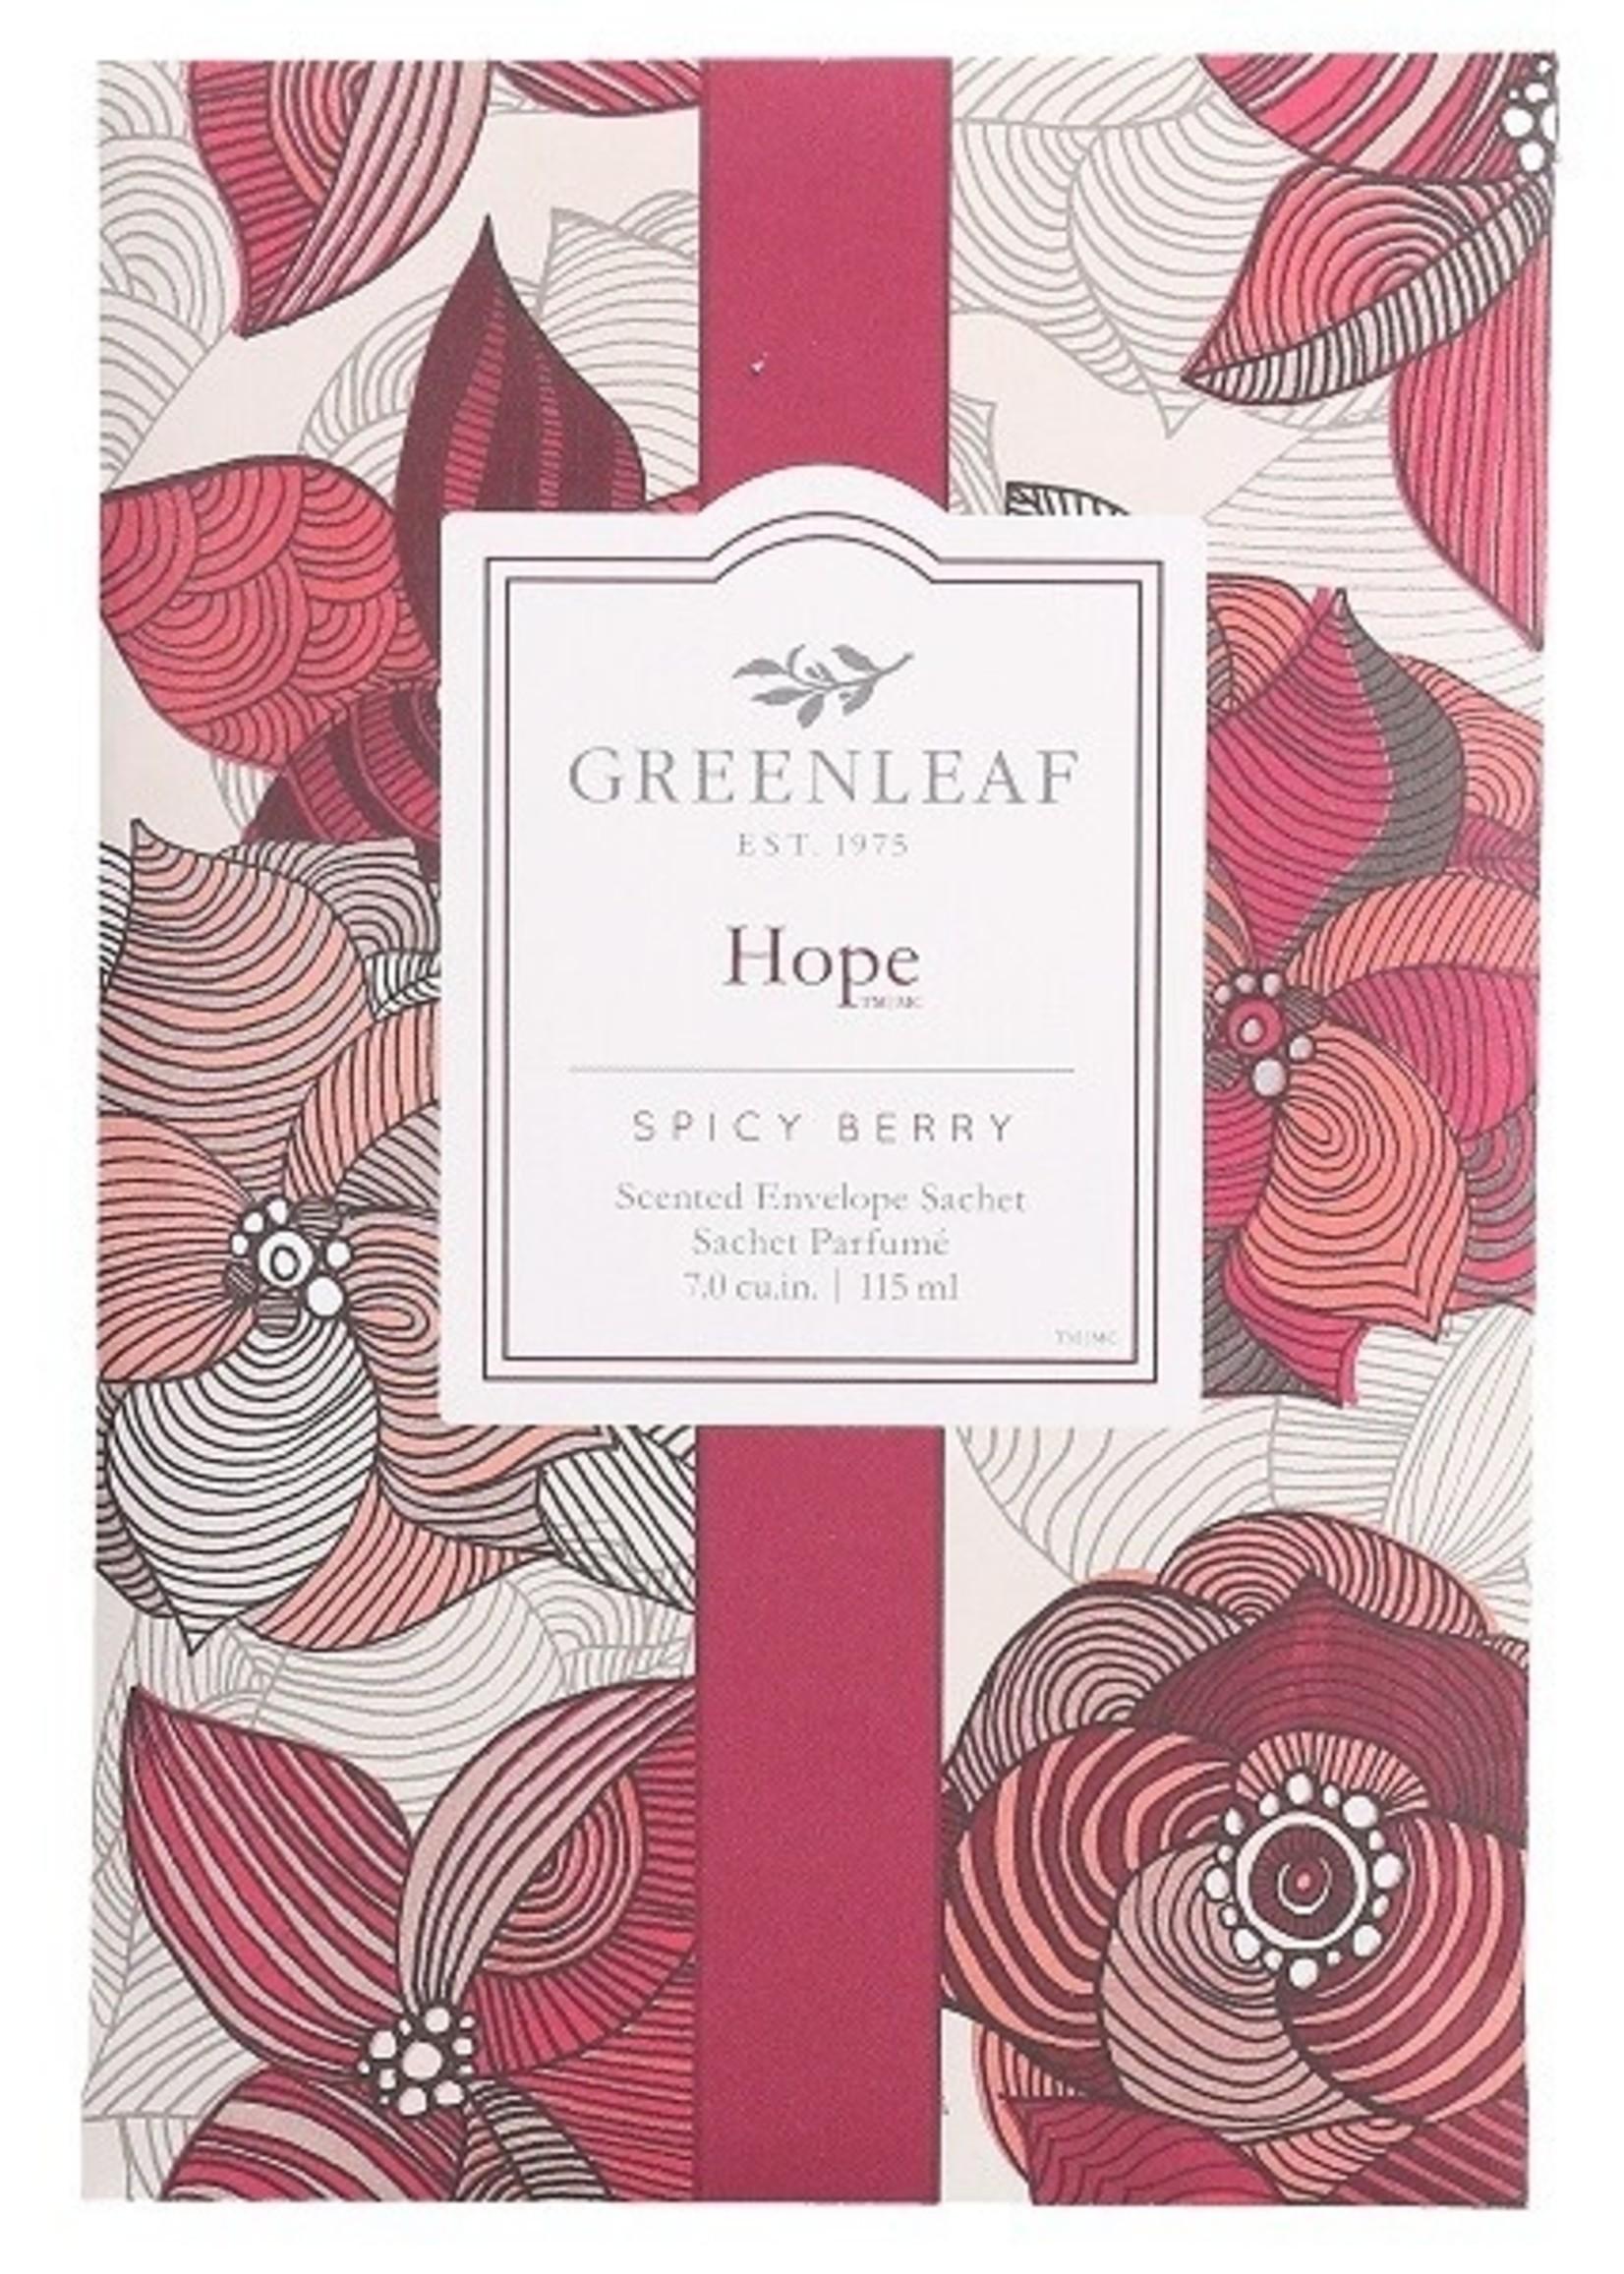 Greenleaf Greenleaf Geurzakje Hope